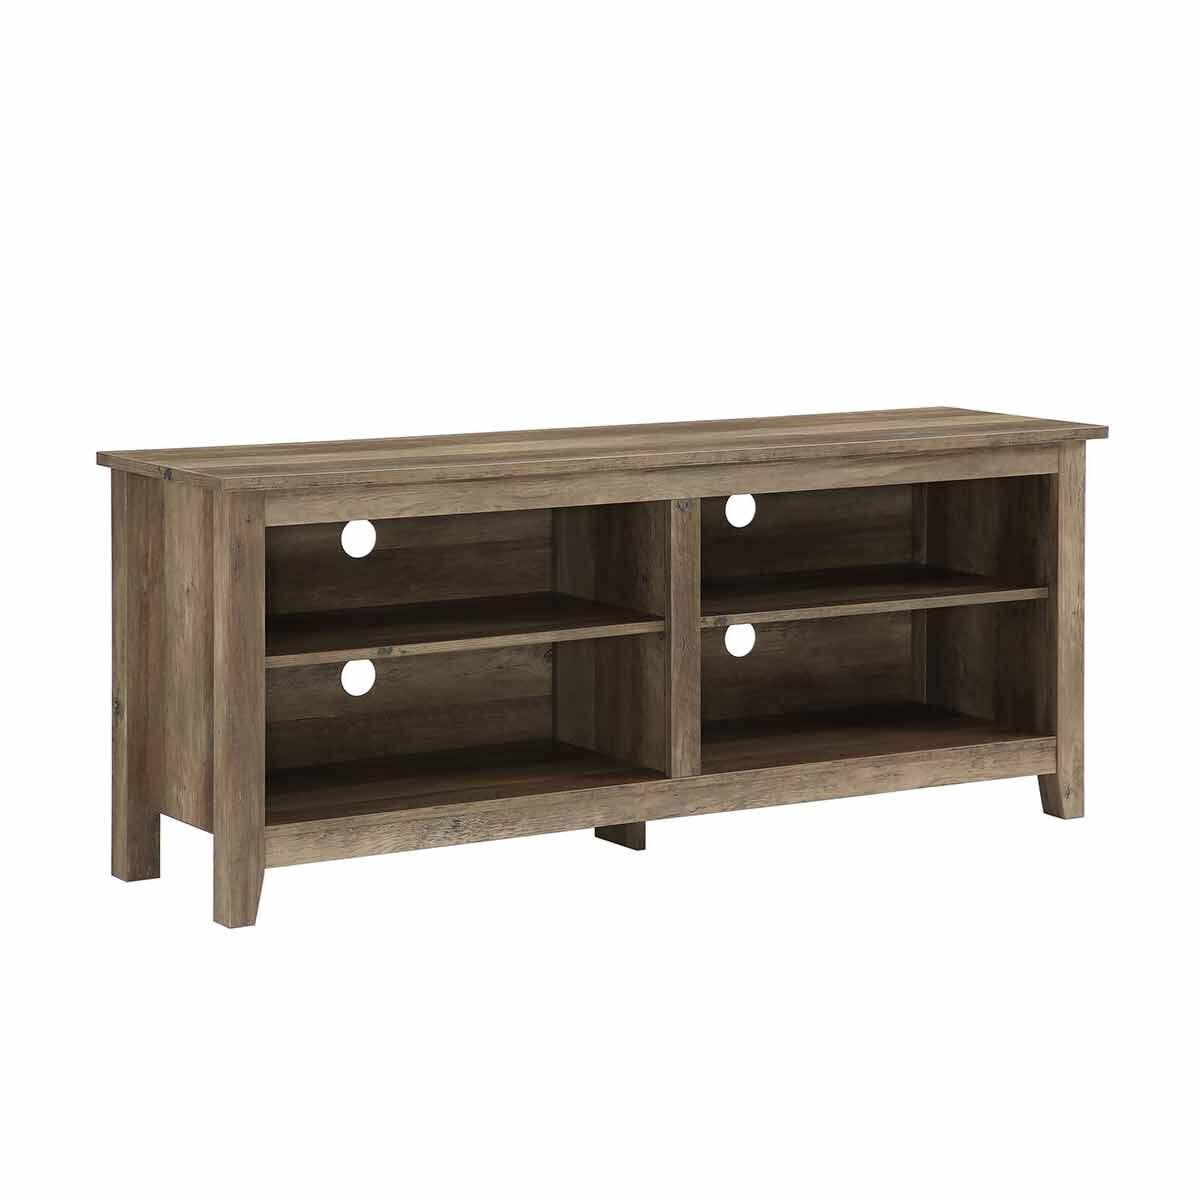 Cosenza Rustic Wood TV Stand Oak effect